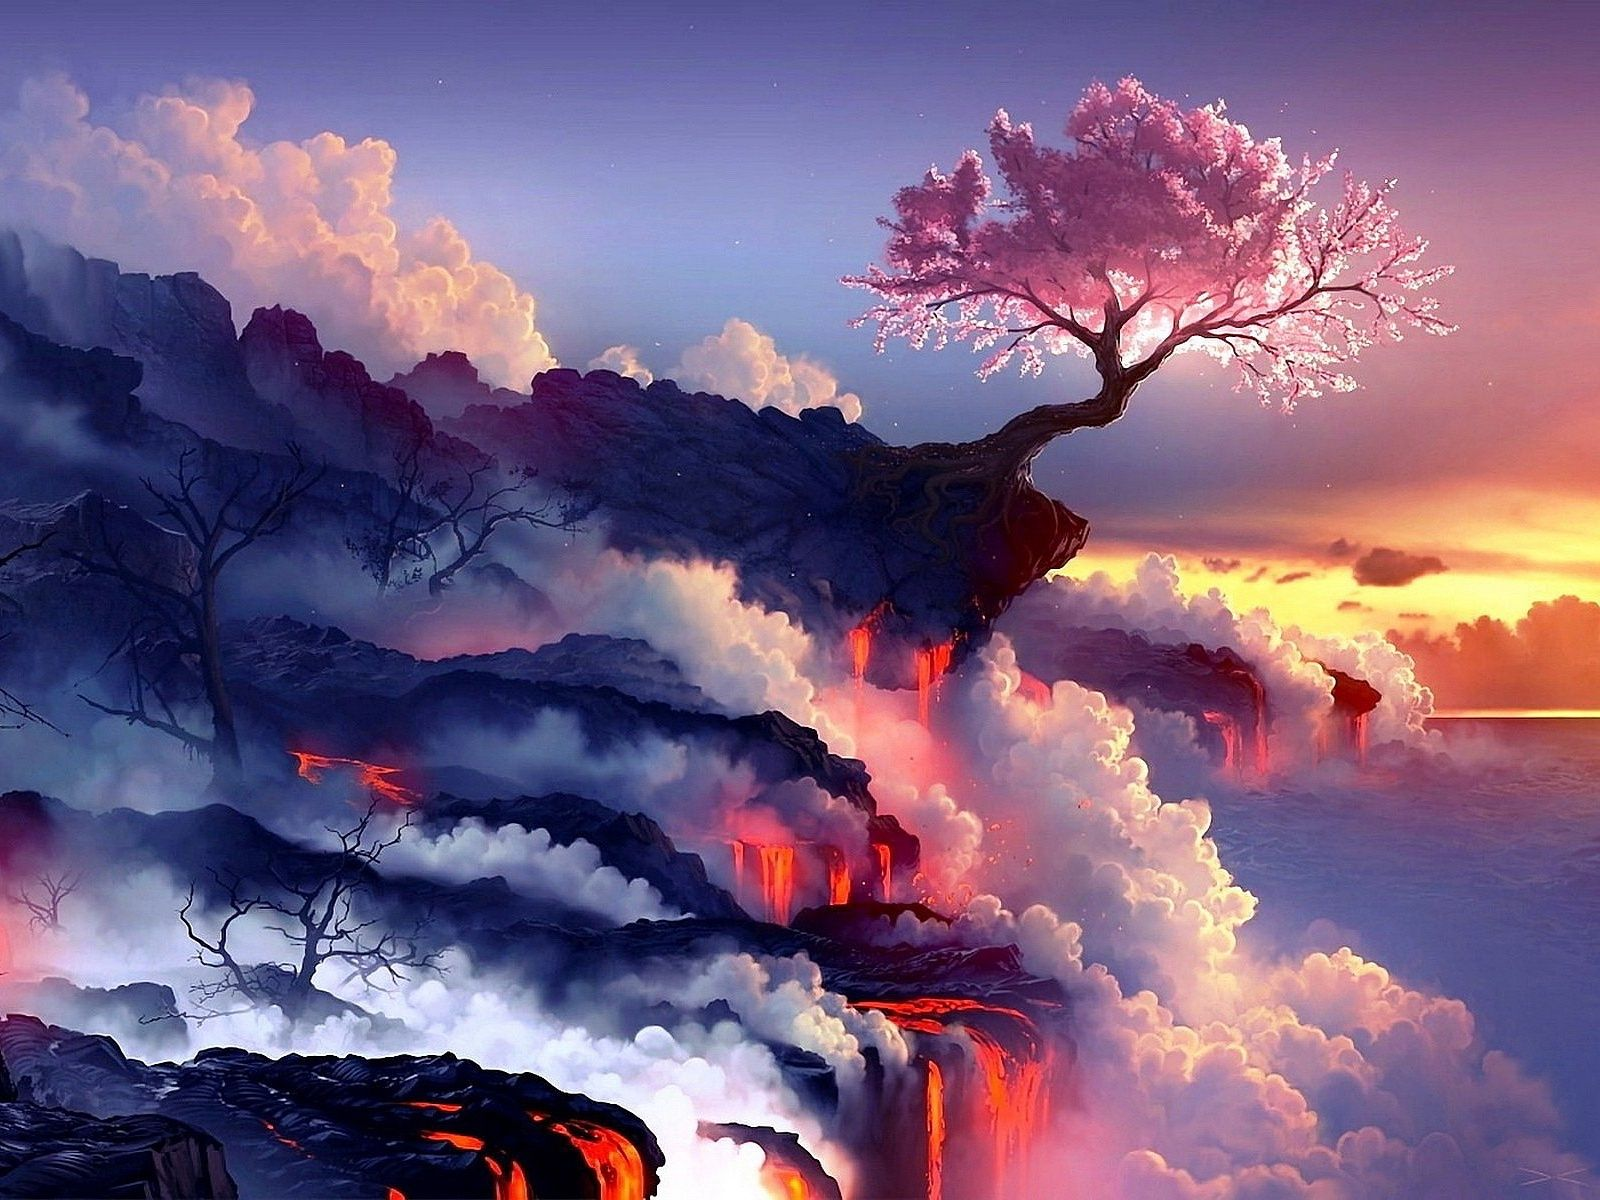 Japan Cherry Tree In Valcano Landscape Wallpaper Volcano Wallpaper Fantasy Landscape